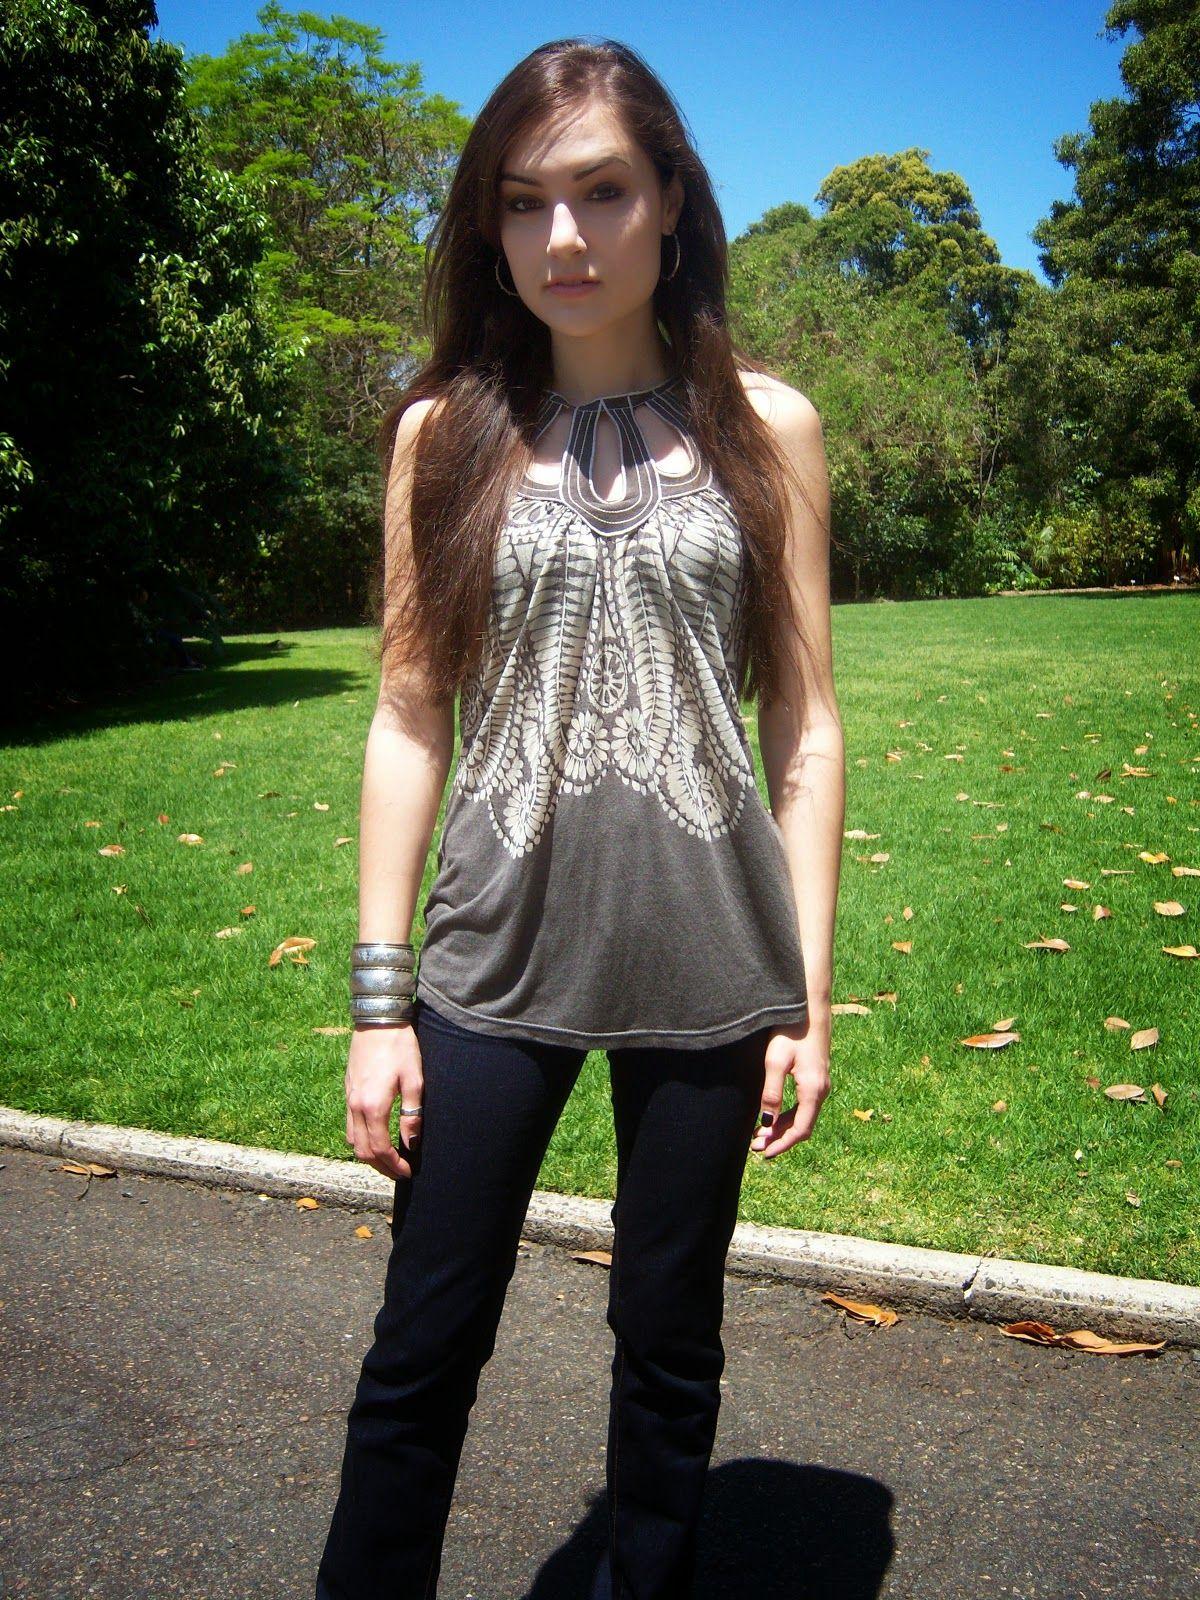 Sasha Grey Hd Pictures Hd Wallpapers Of Sasha Grey Hd Photos